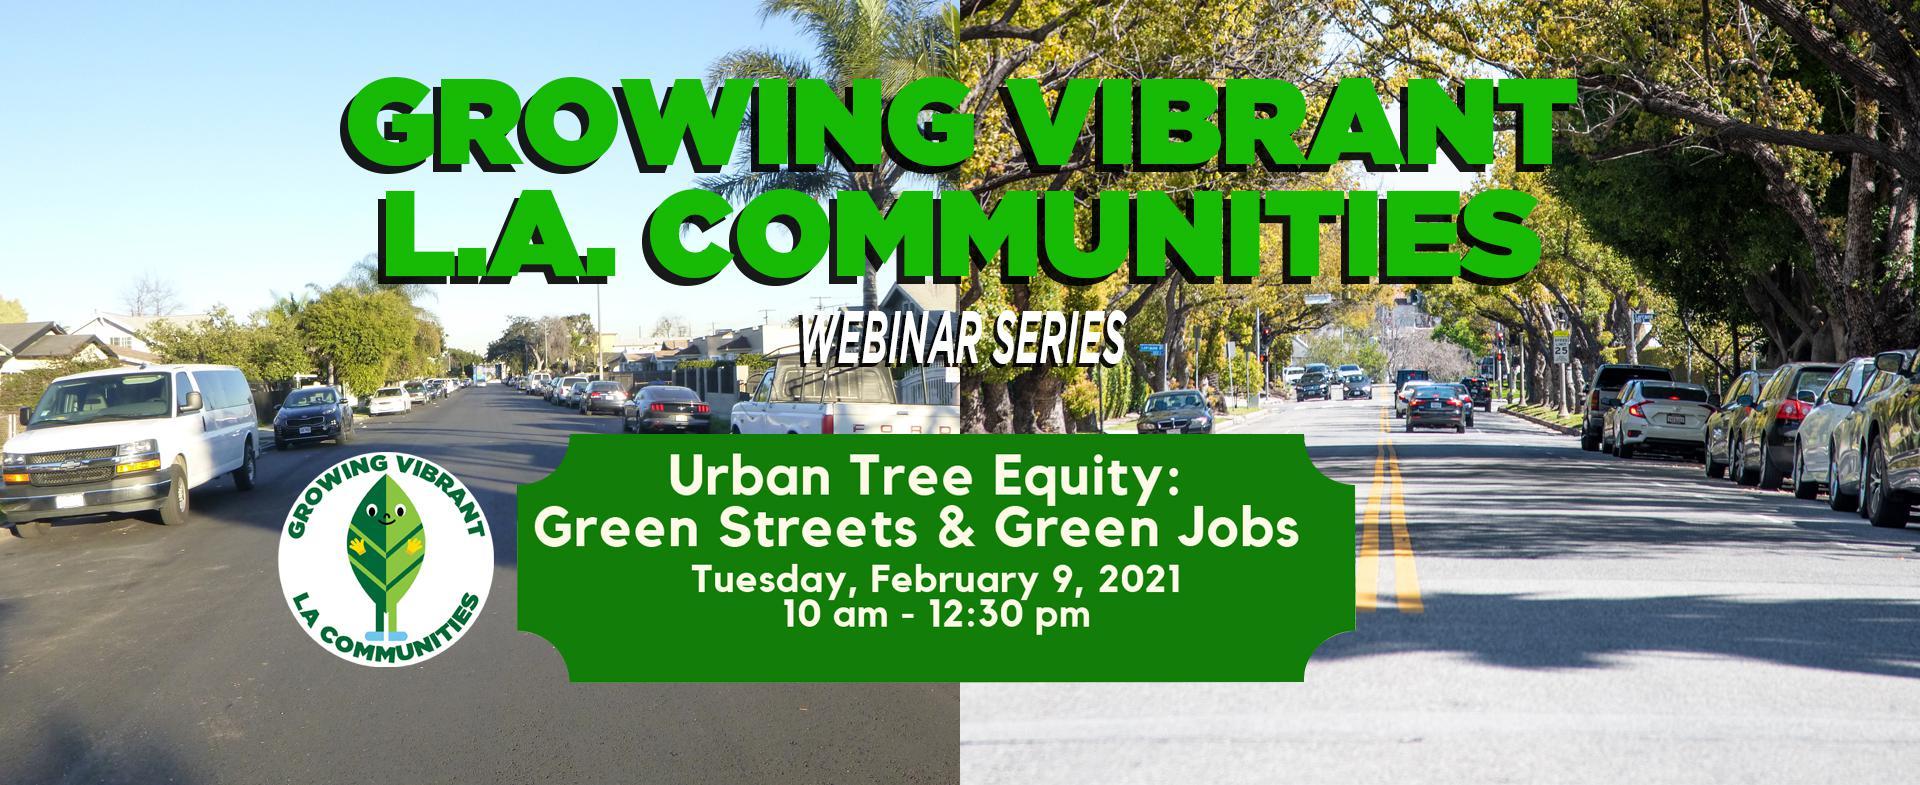 Growing Vibrant LA Communities